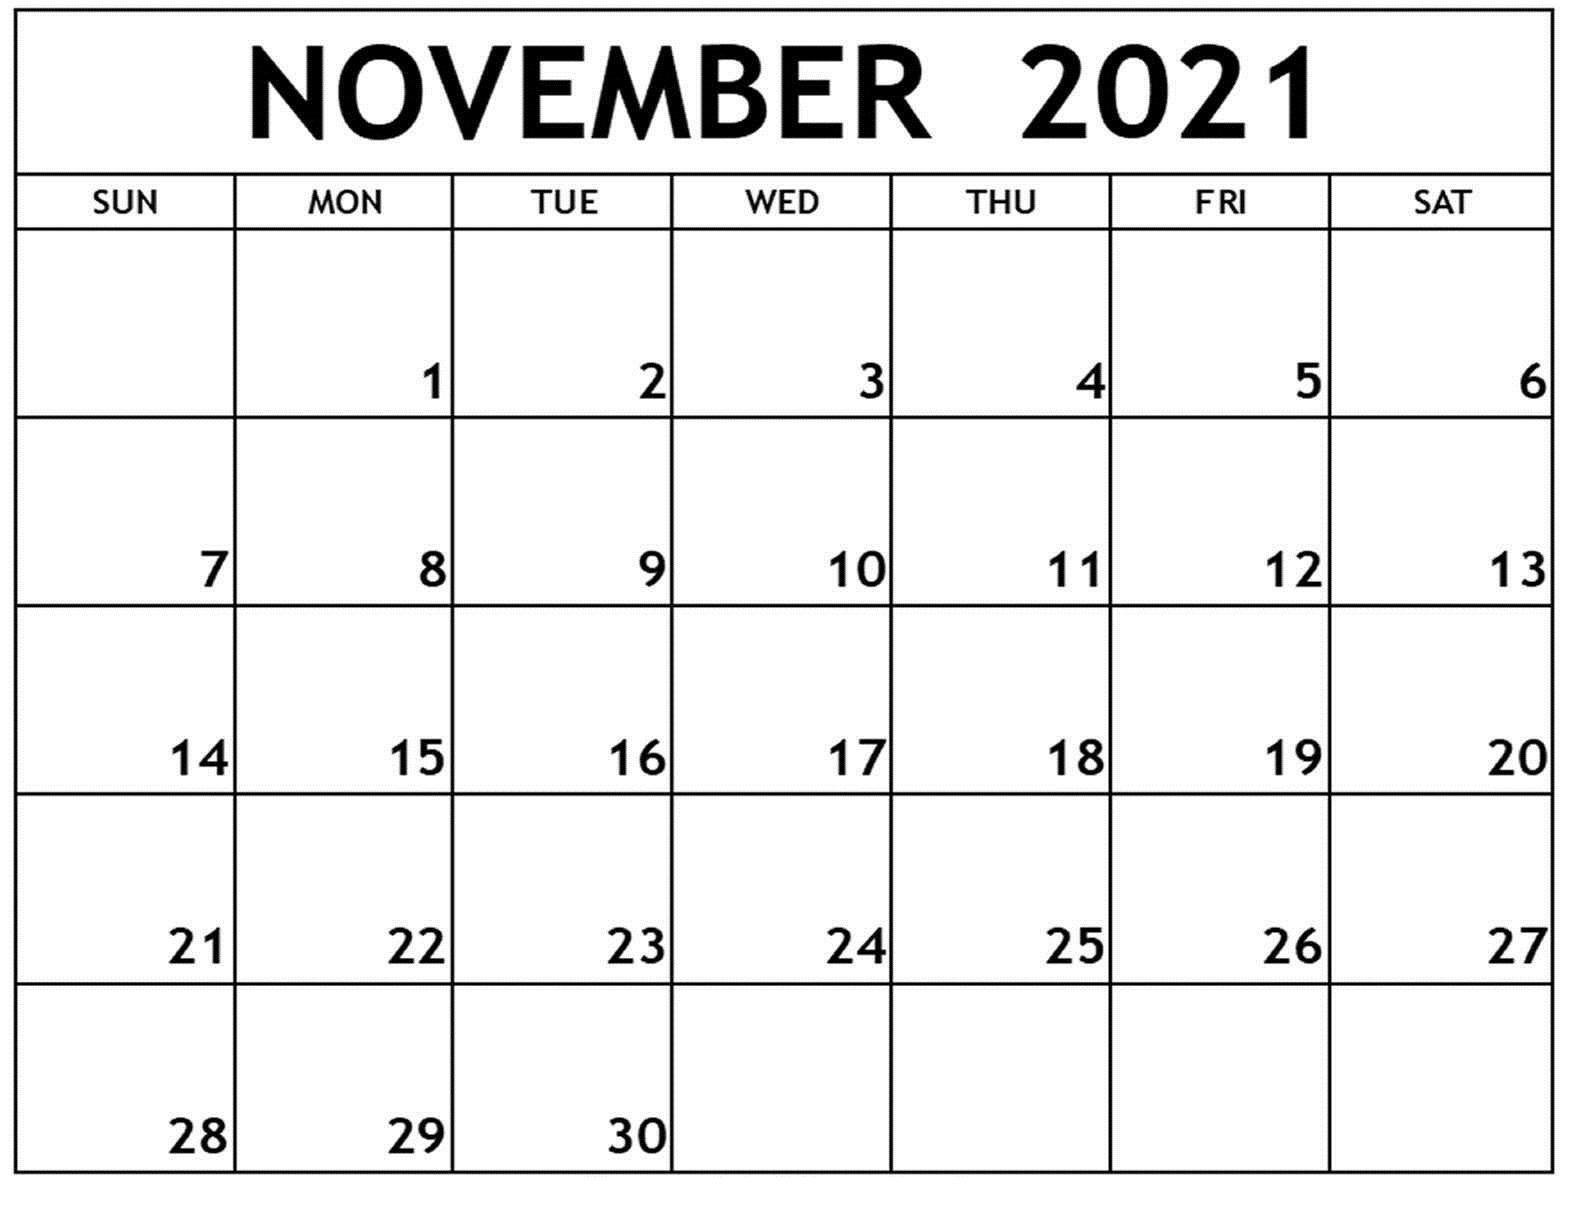 2021 November Calendar Month